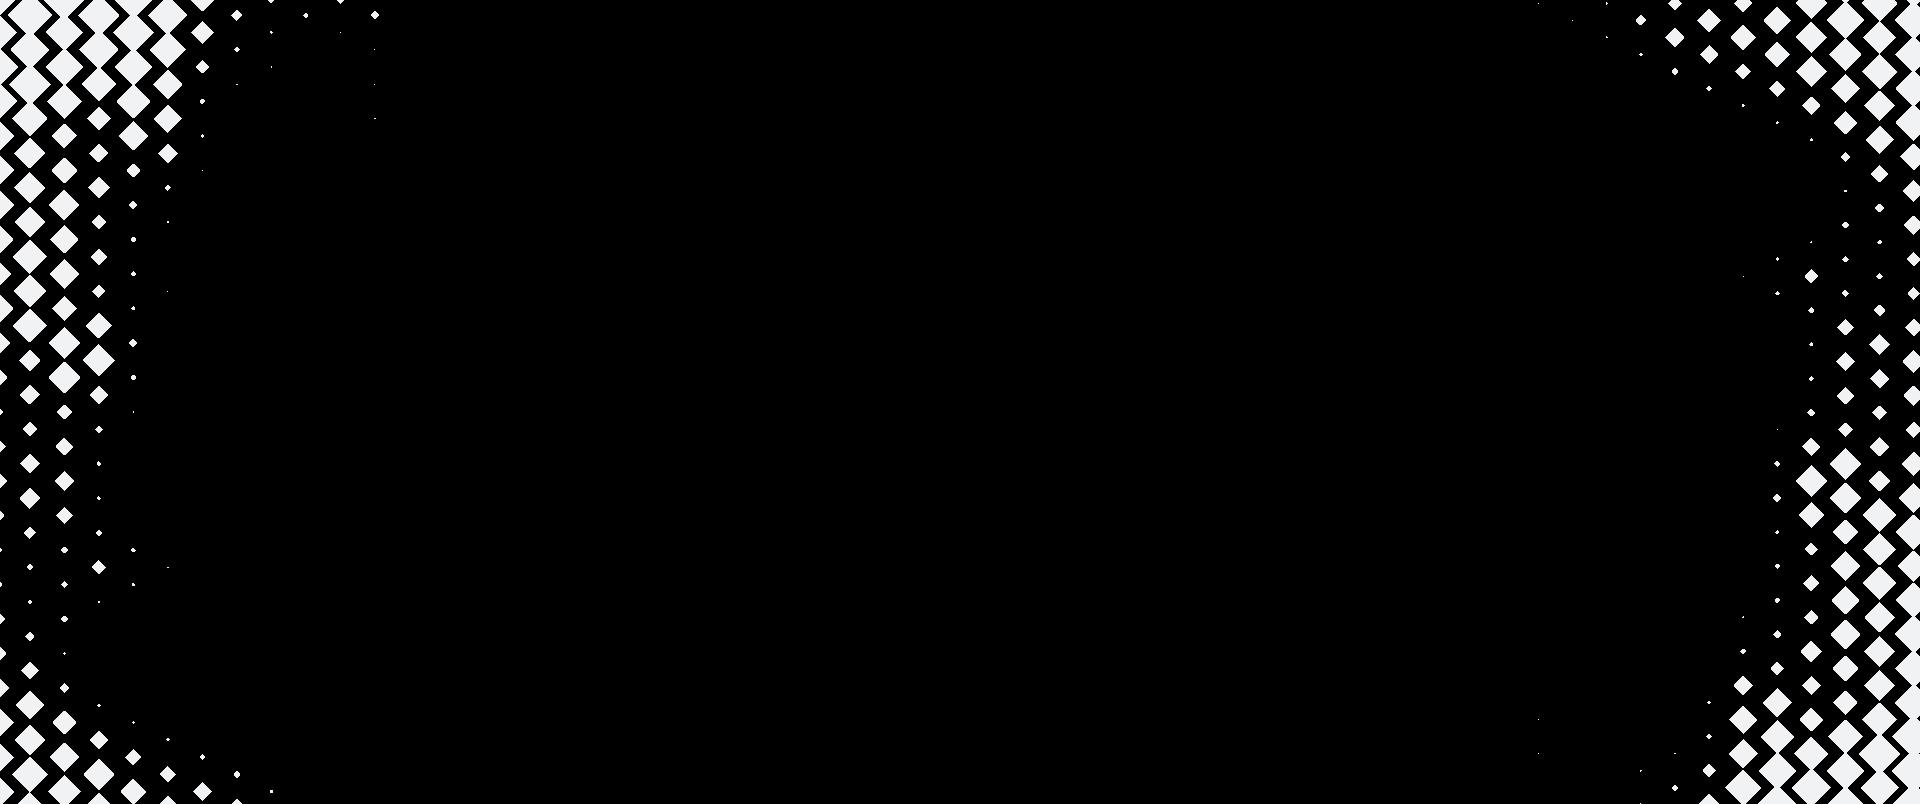 sol-bg-pattern